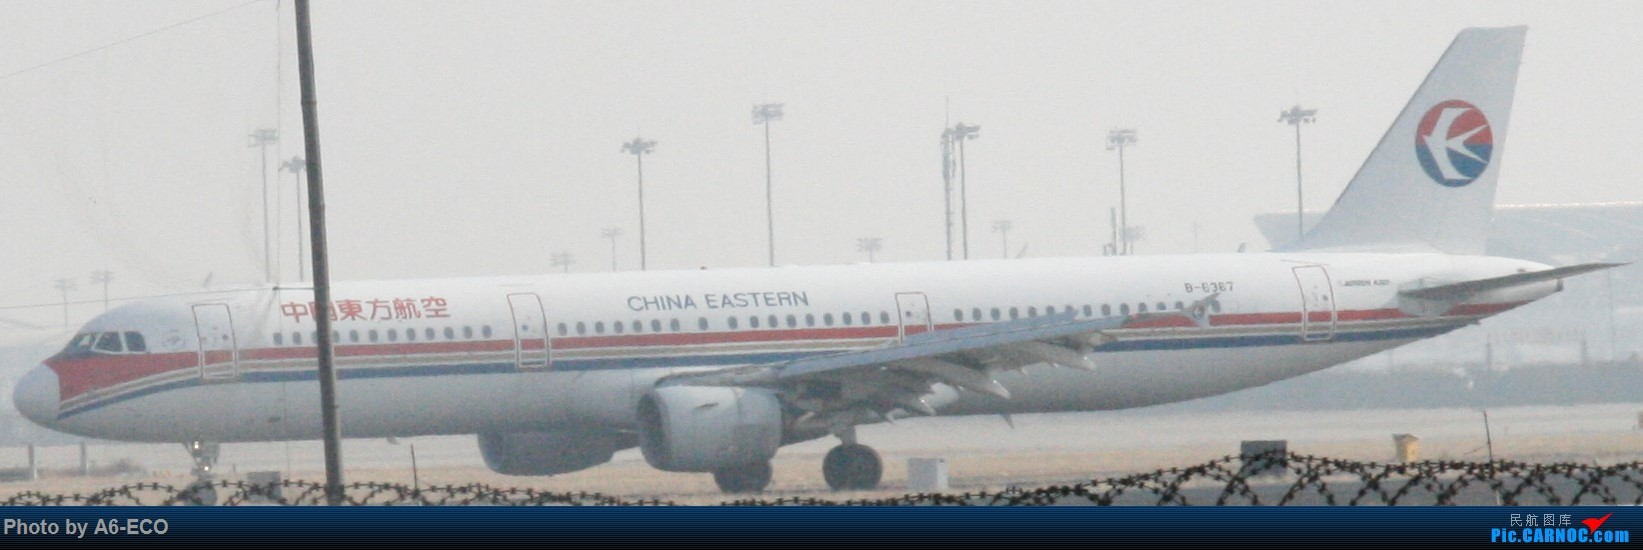 Re:[原创]今天运气极好,云南孔雀,B-1070,2个菜航邮戳,泡菜航彩绘,东航邮戳...... AIRBUS A321-200 B-6367 中国北京首都国际机场